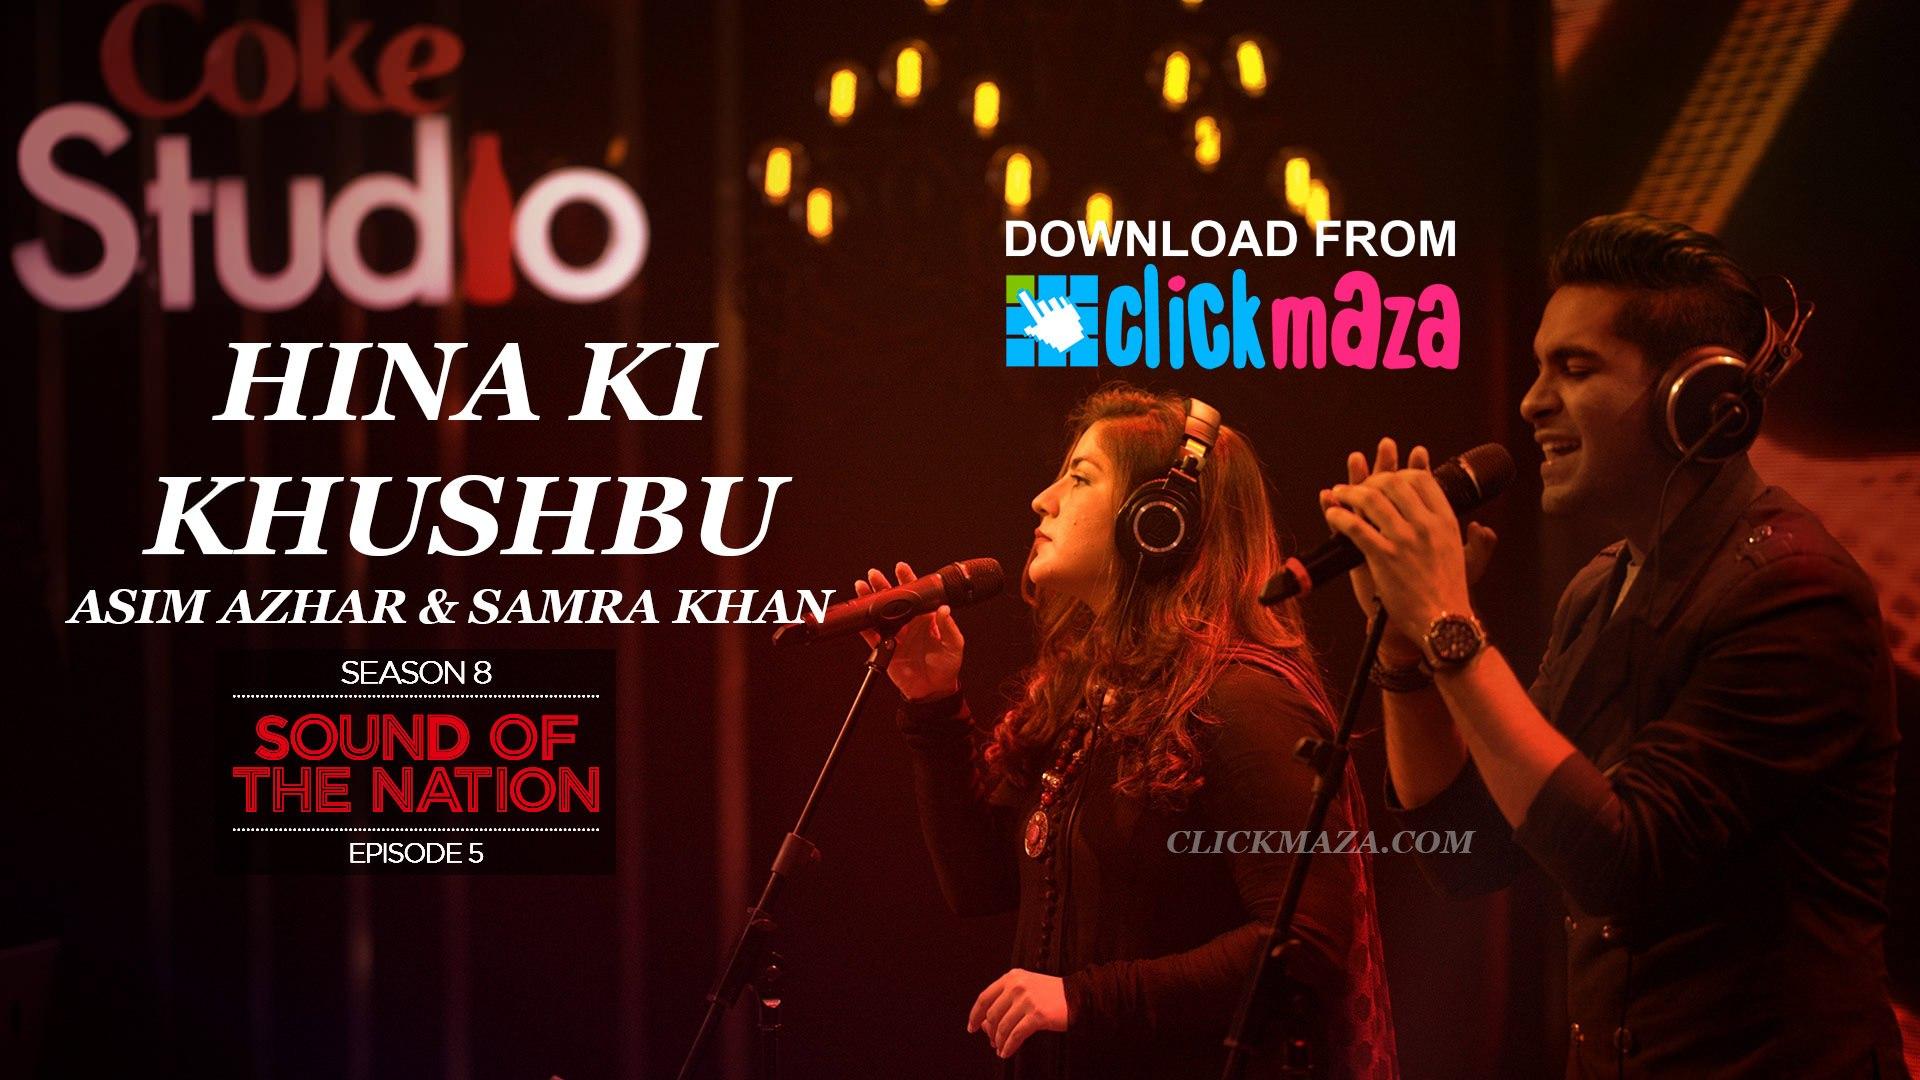 hina ki khushboo coke studio video